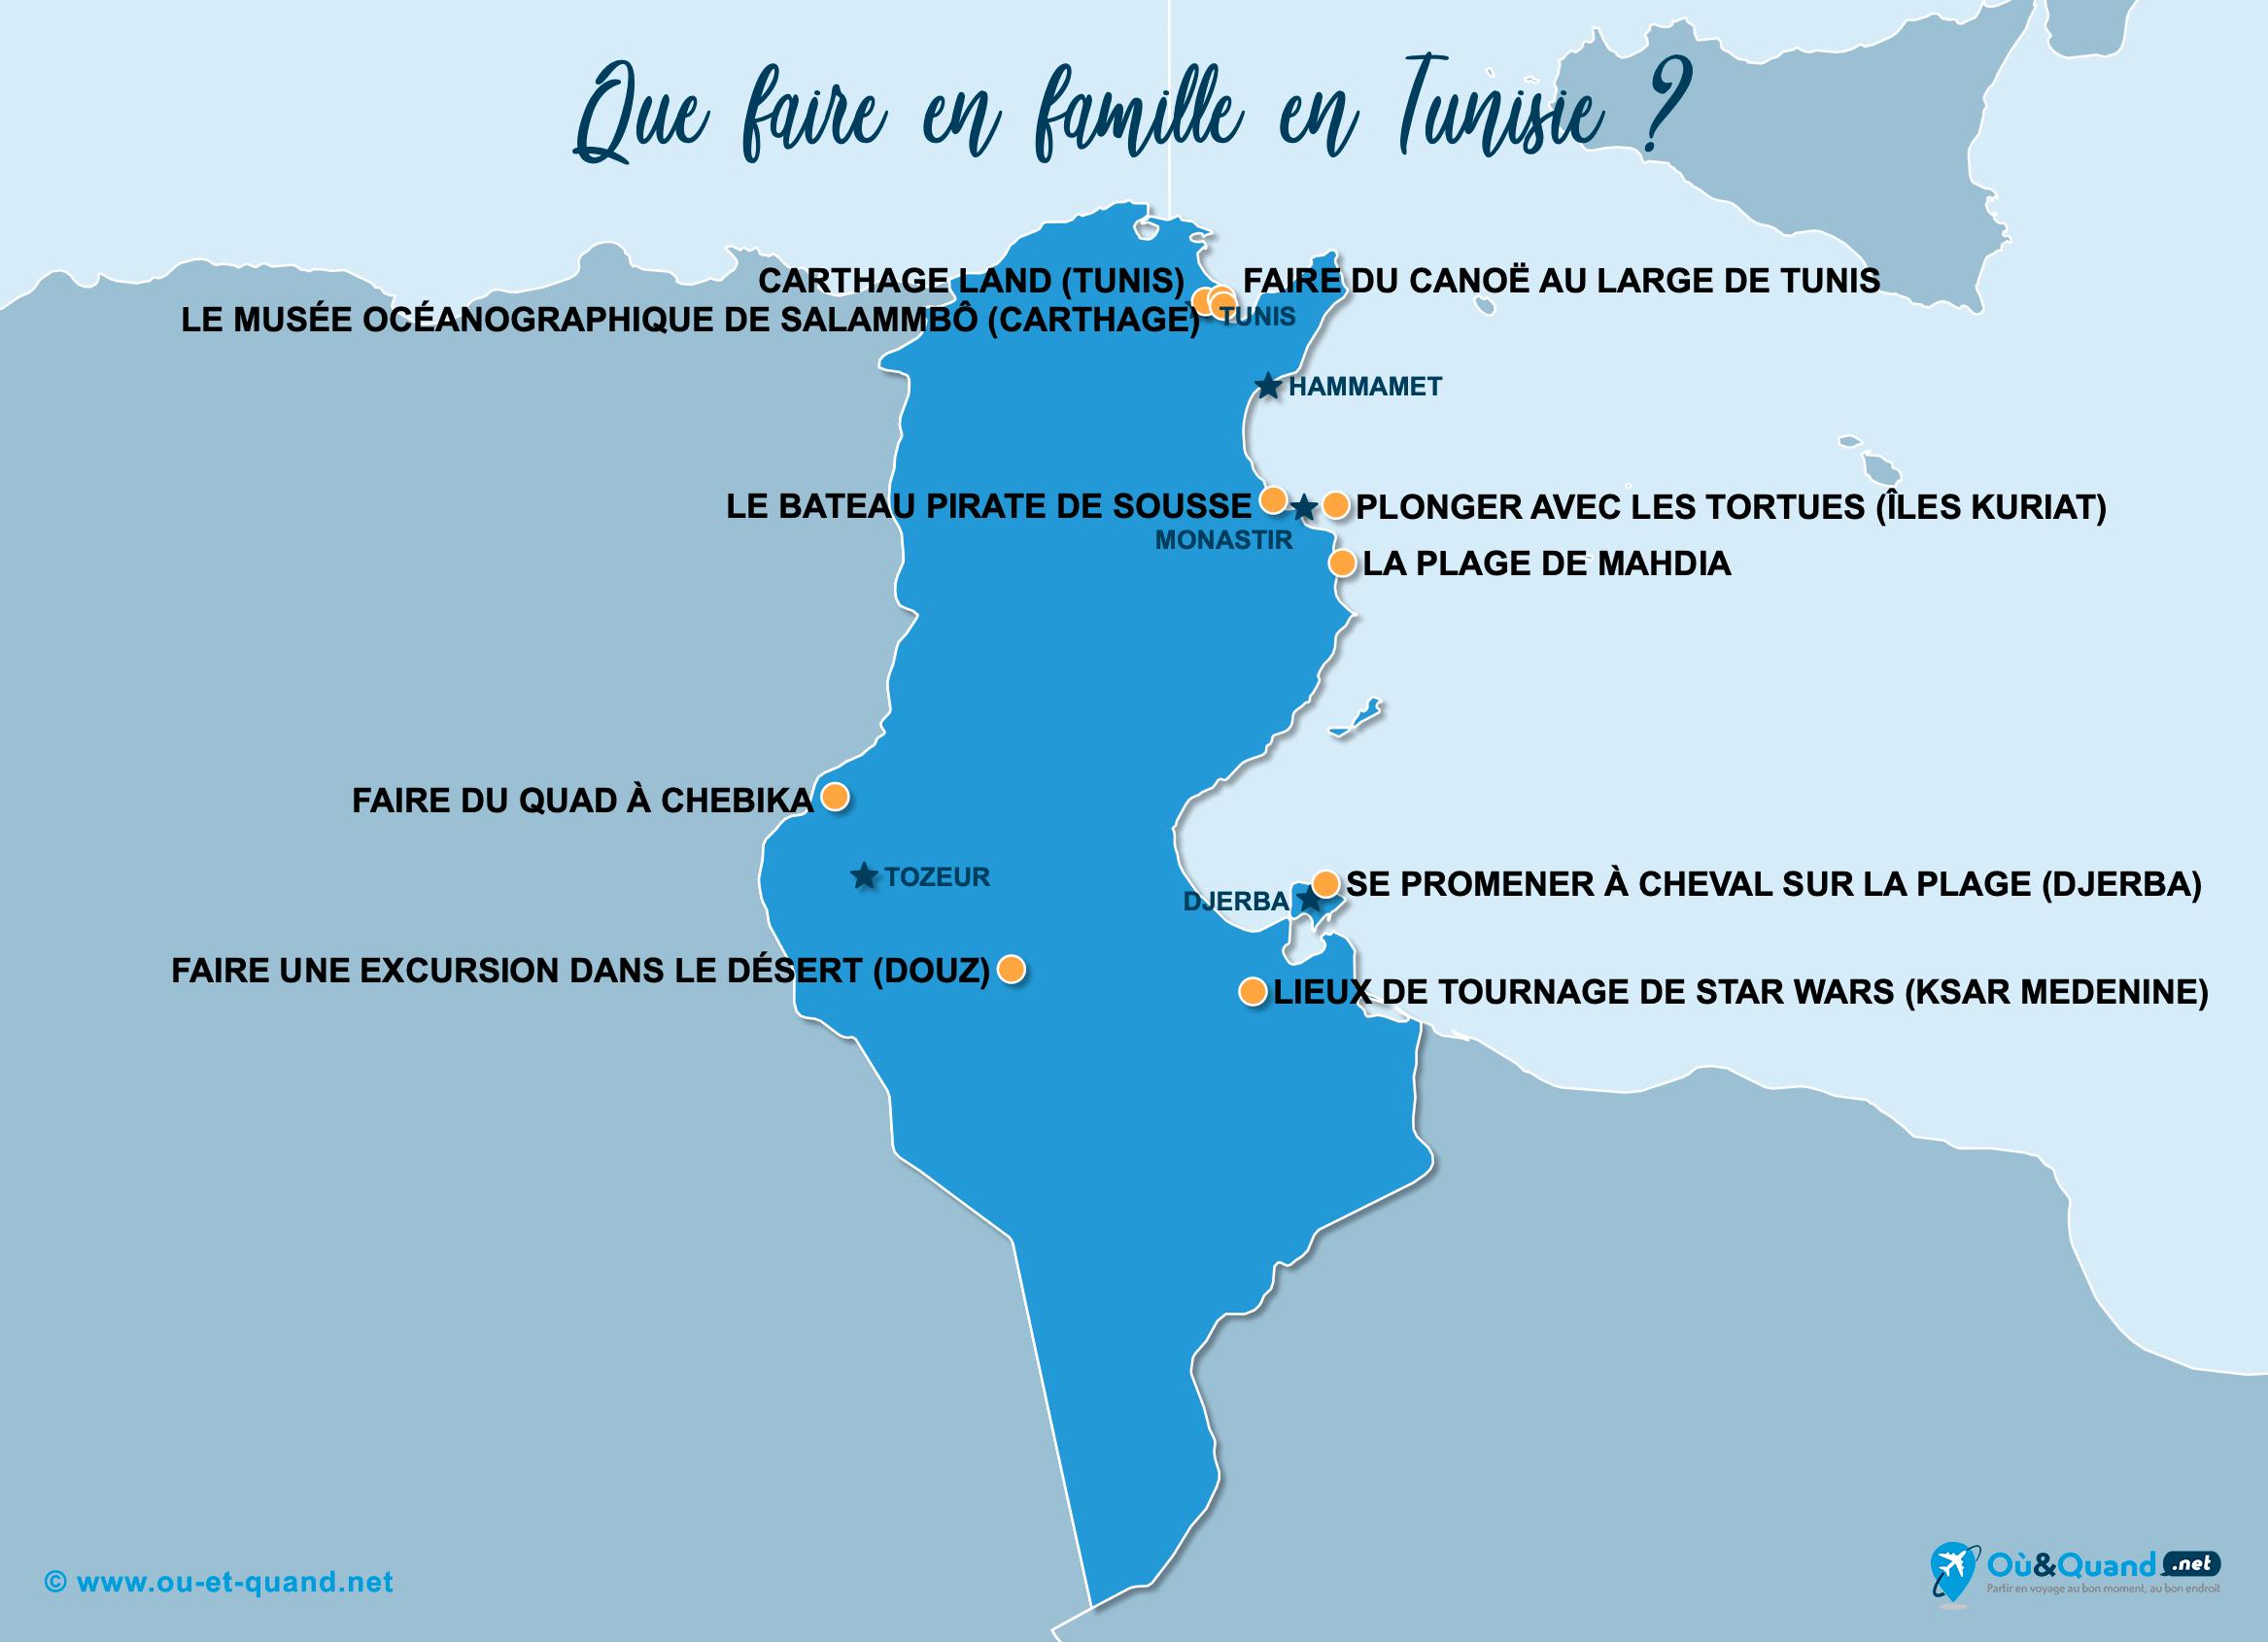 Carte Tunisie : La Tunisie en famille